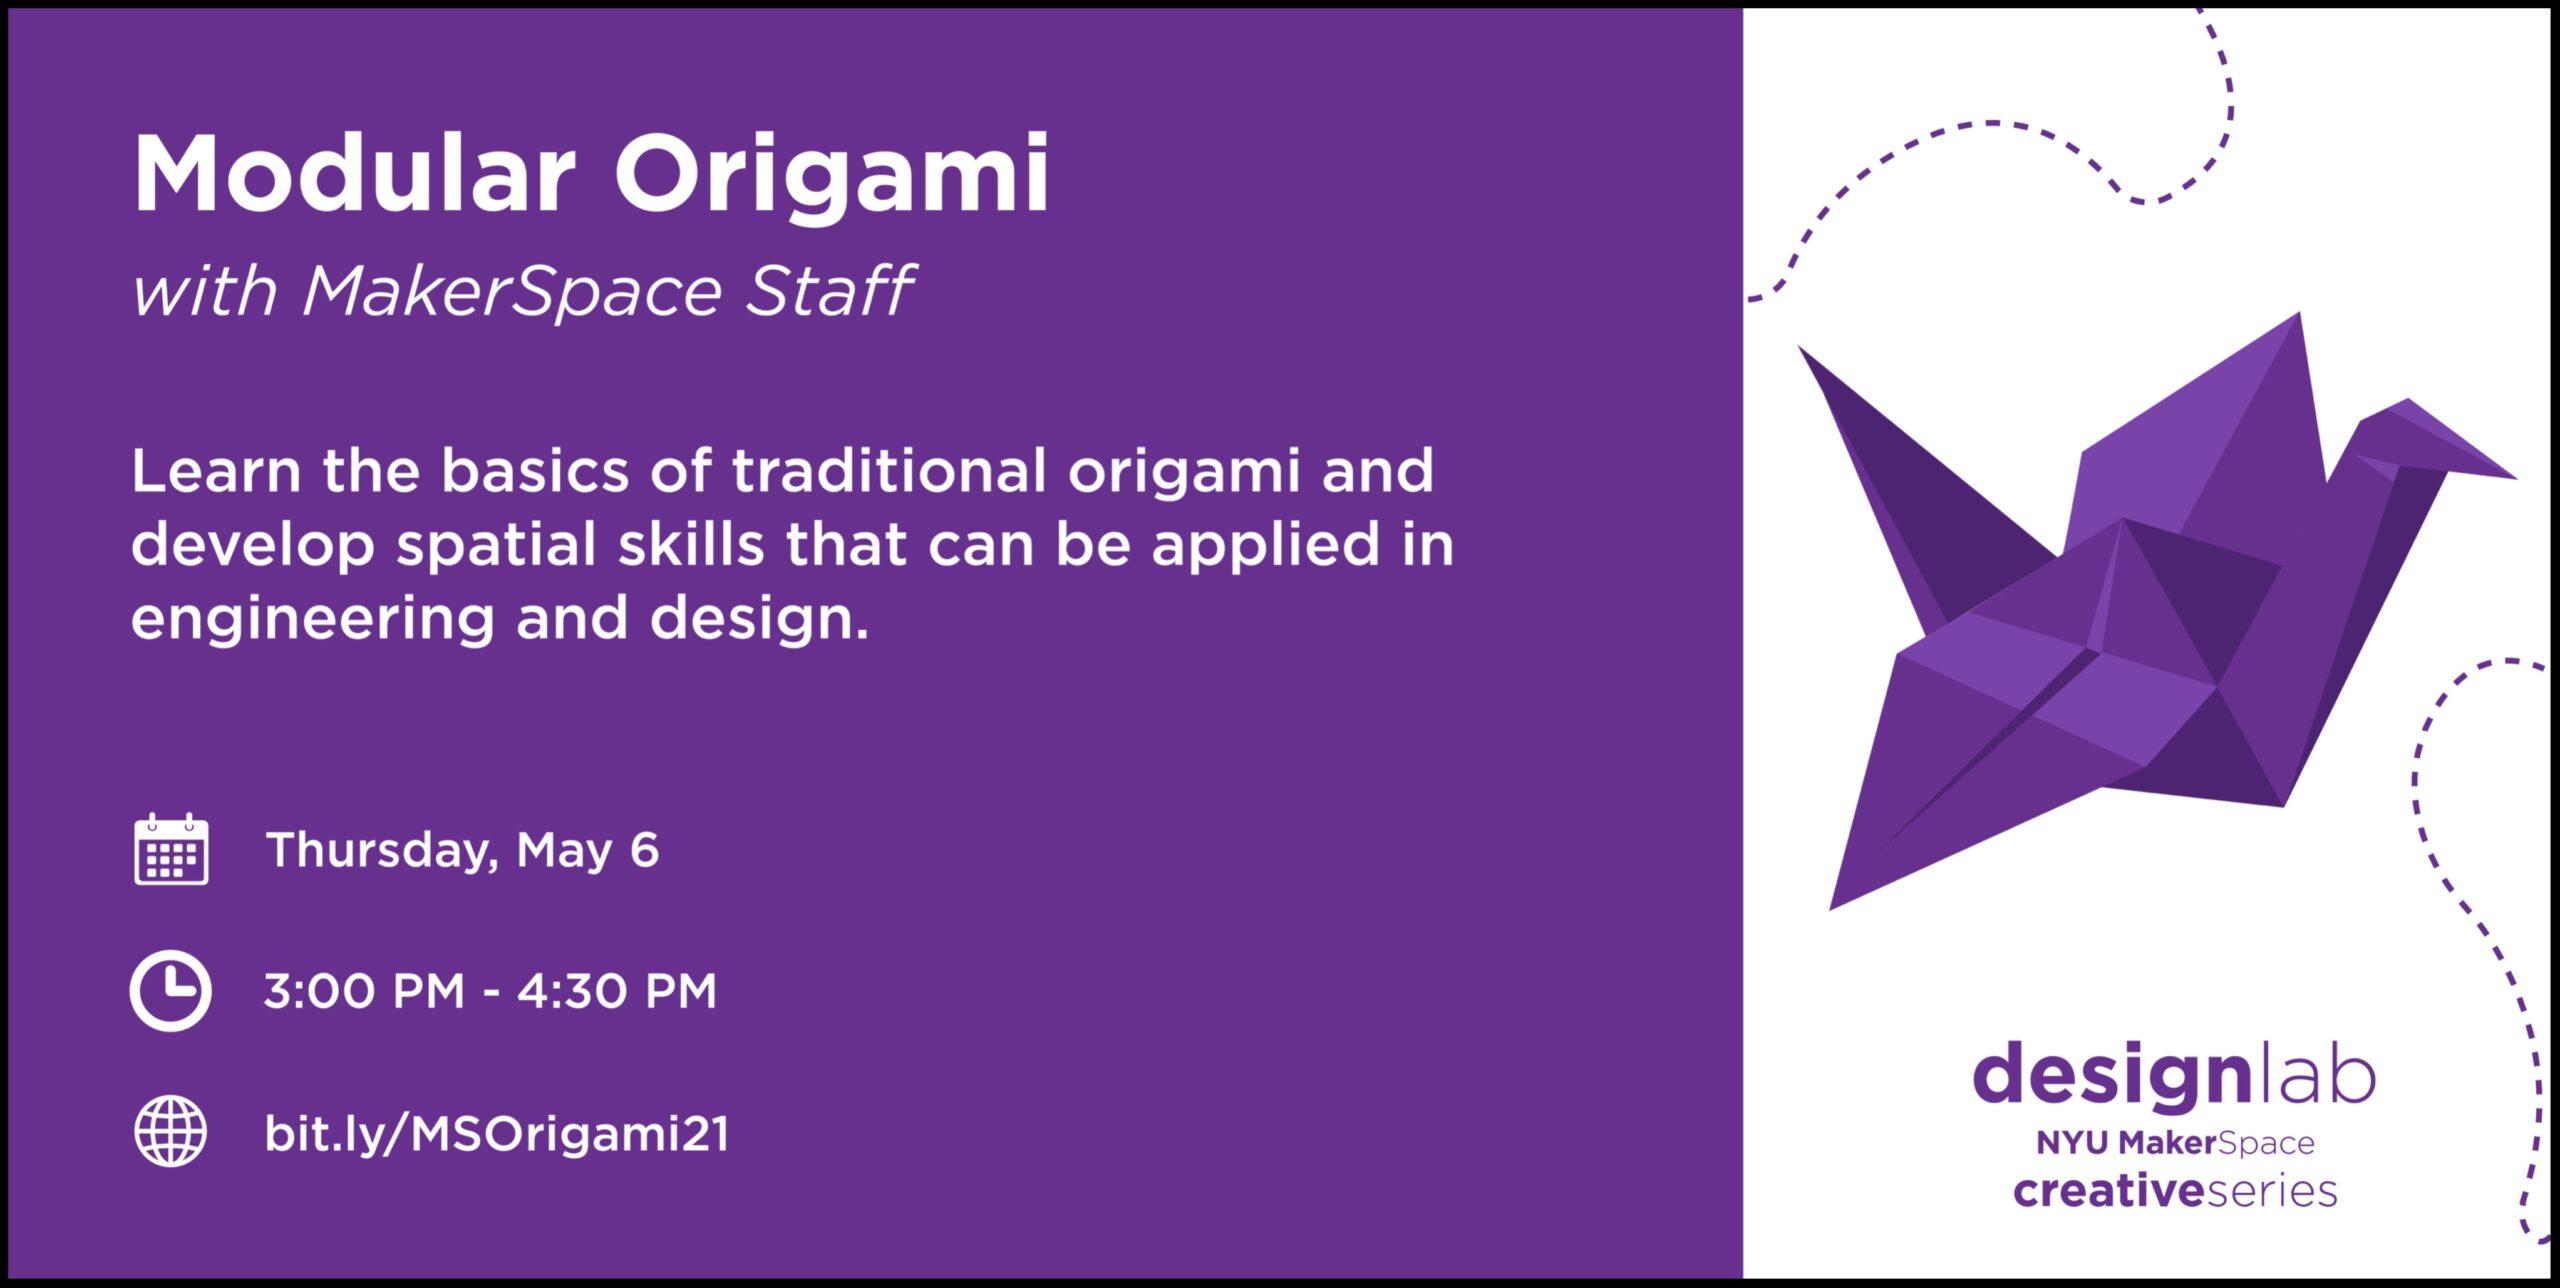 Modular Origami Flyer